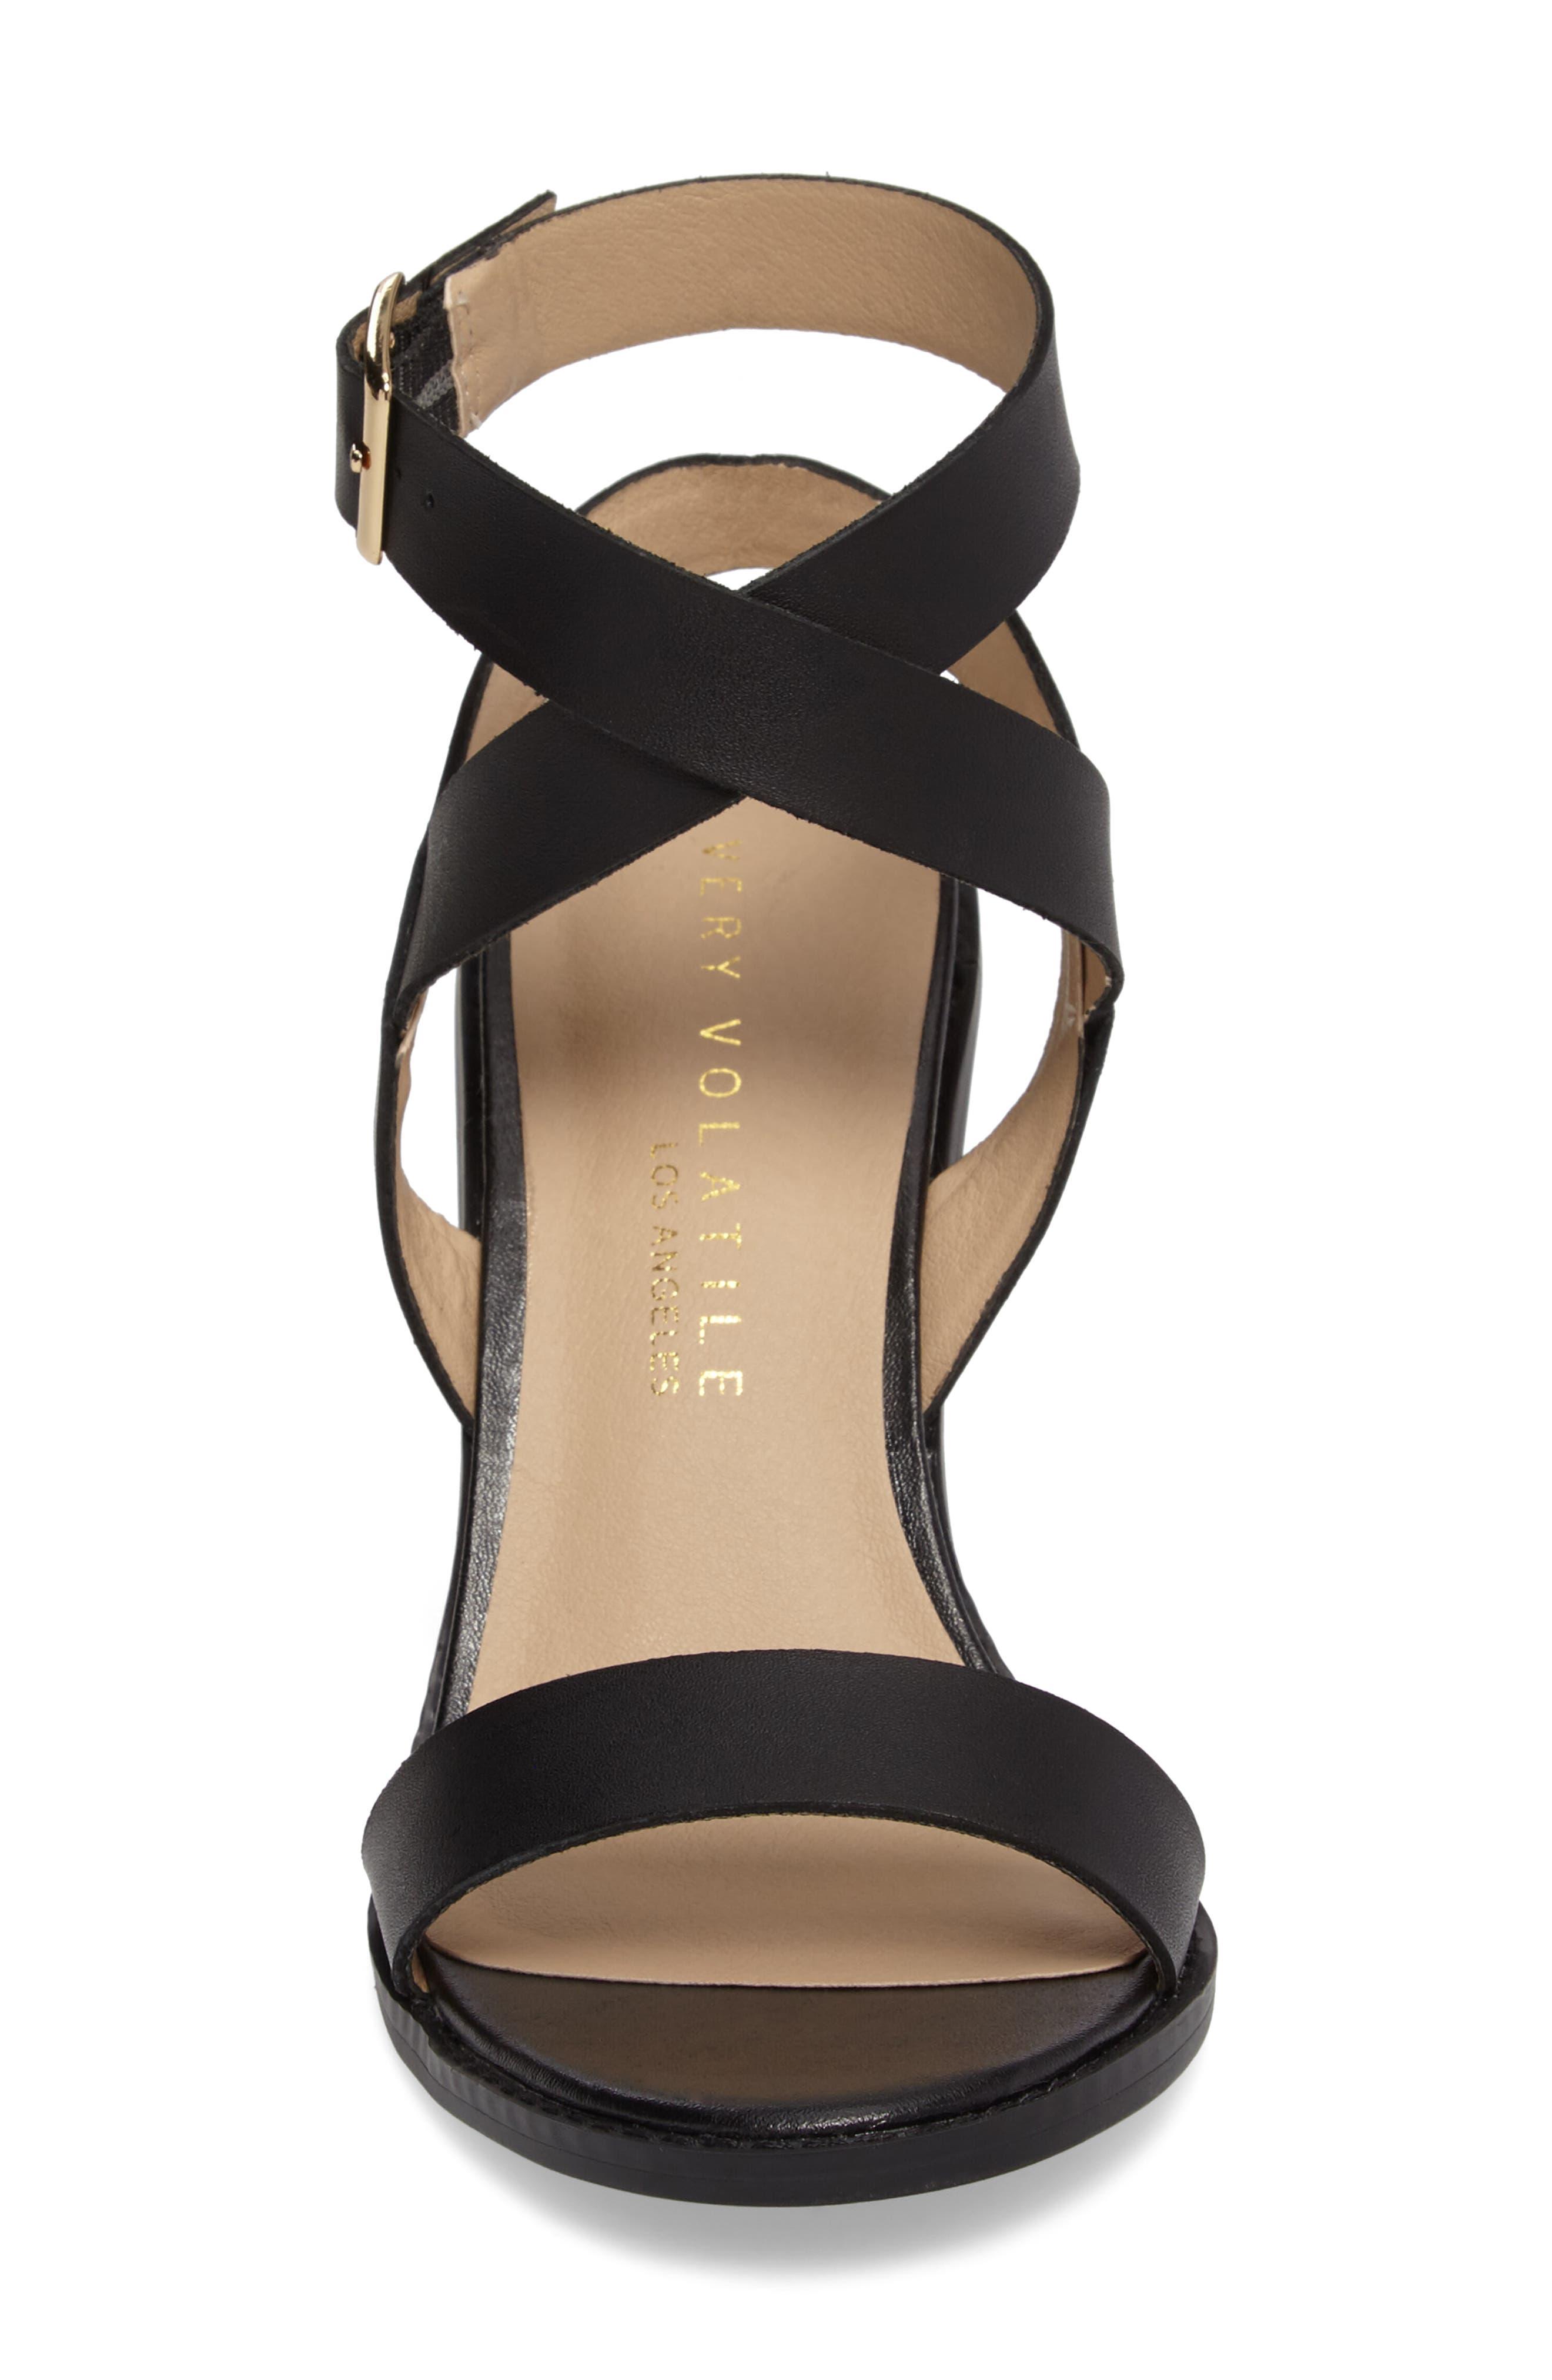 Poshy Ankle Wrap Sandal,                             Alternate thumbnail 4, color,                             BLACK LEATHER